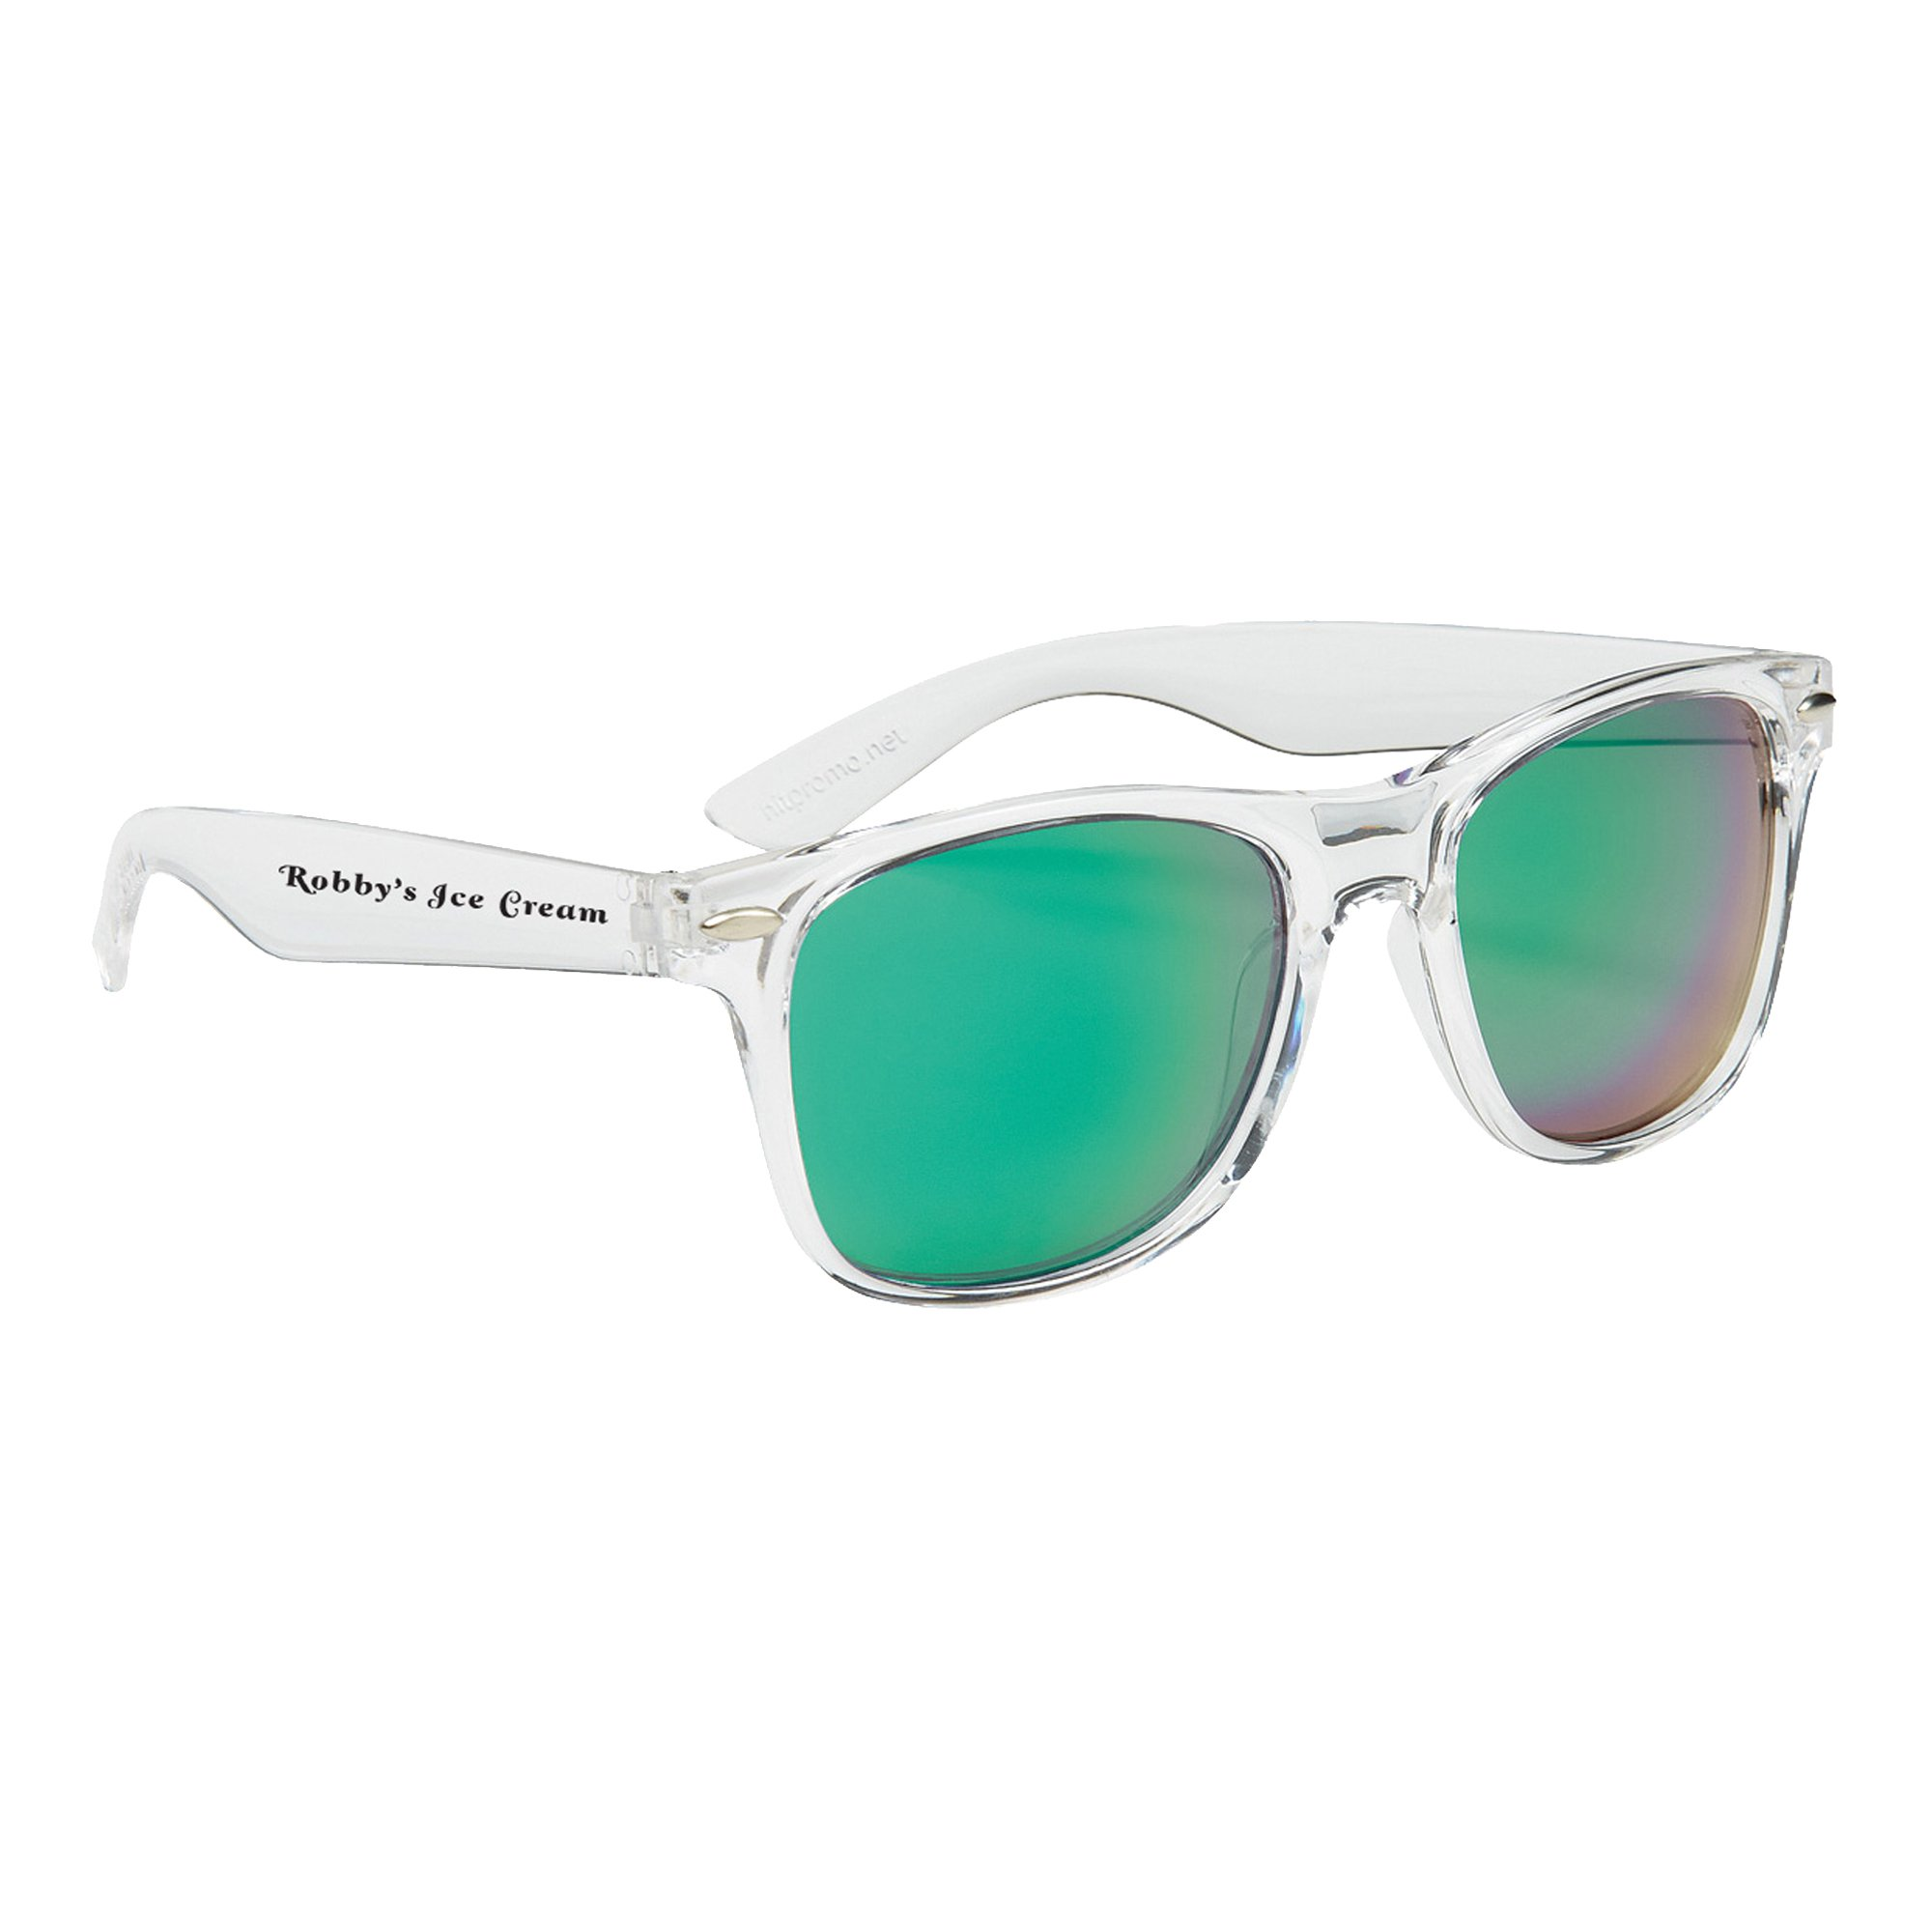 694a3f26a71 Promotional Crystalline Mirrored Malibu Sunglasses